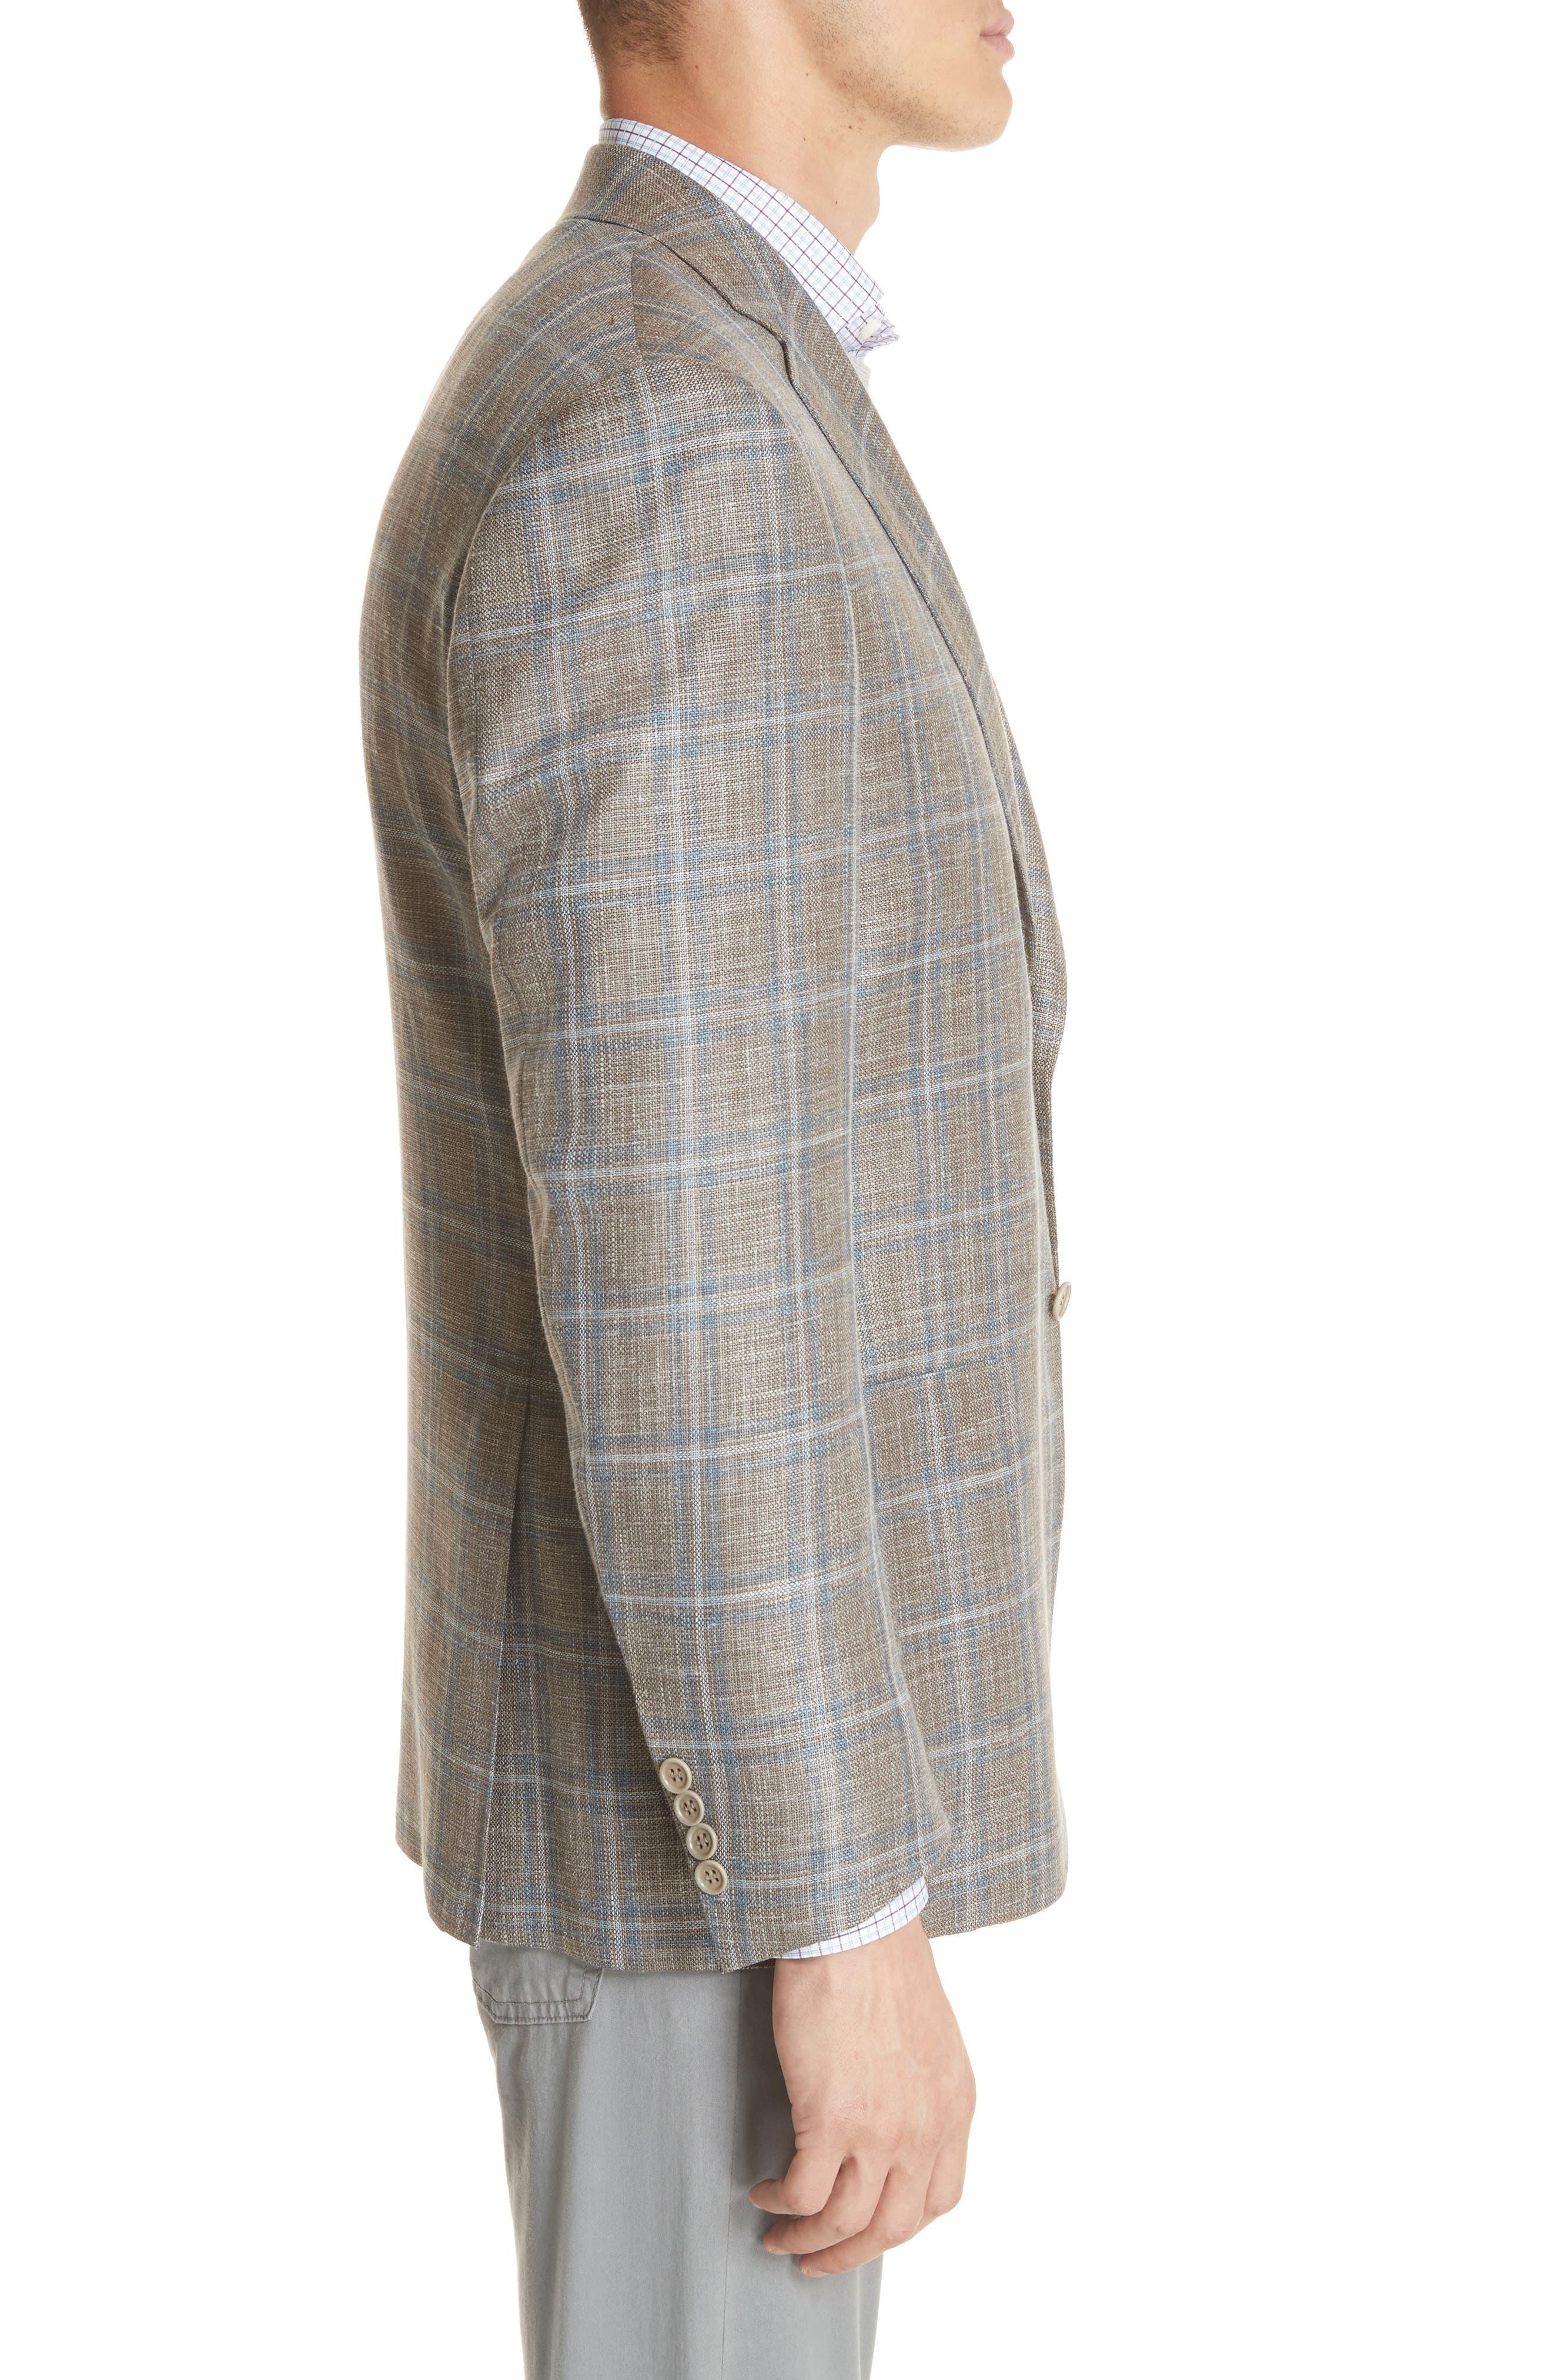 CANALI,                             Kei Classic Fit Windowpane Wool Blend Sport Coat,                             Alternate thumbnail 3, color,                             250